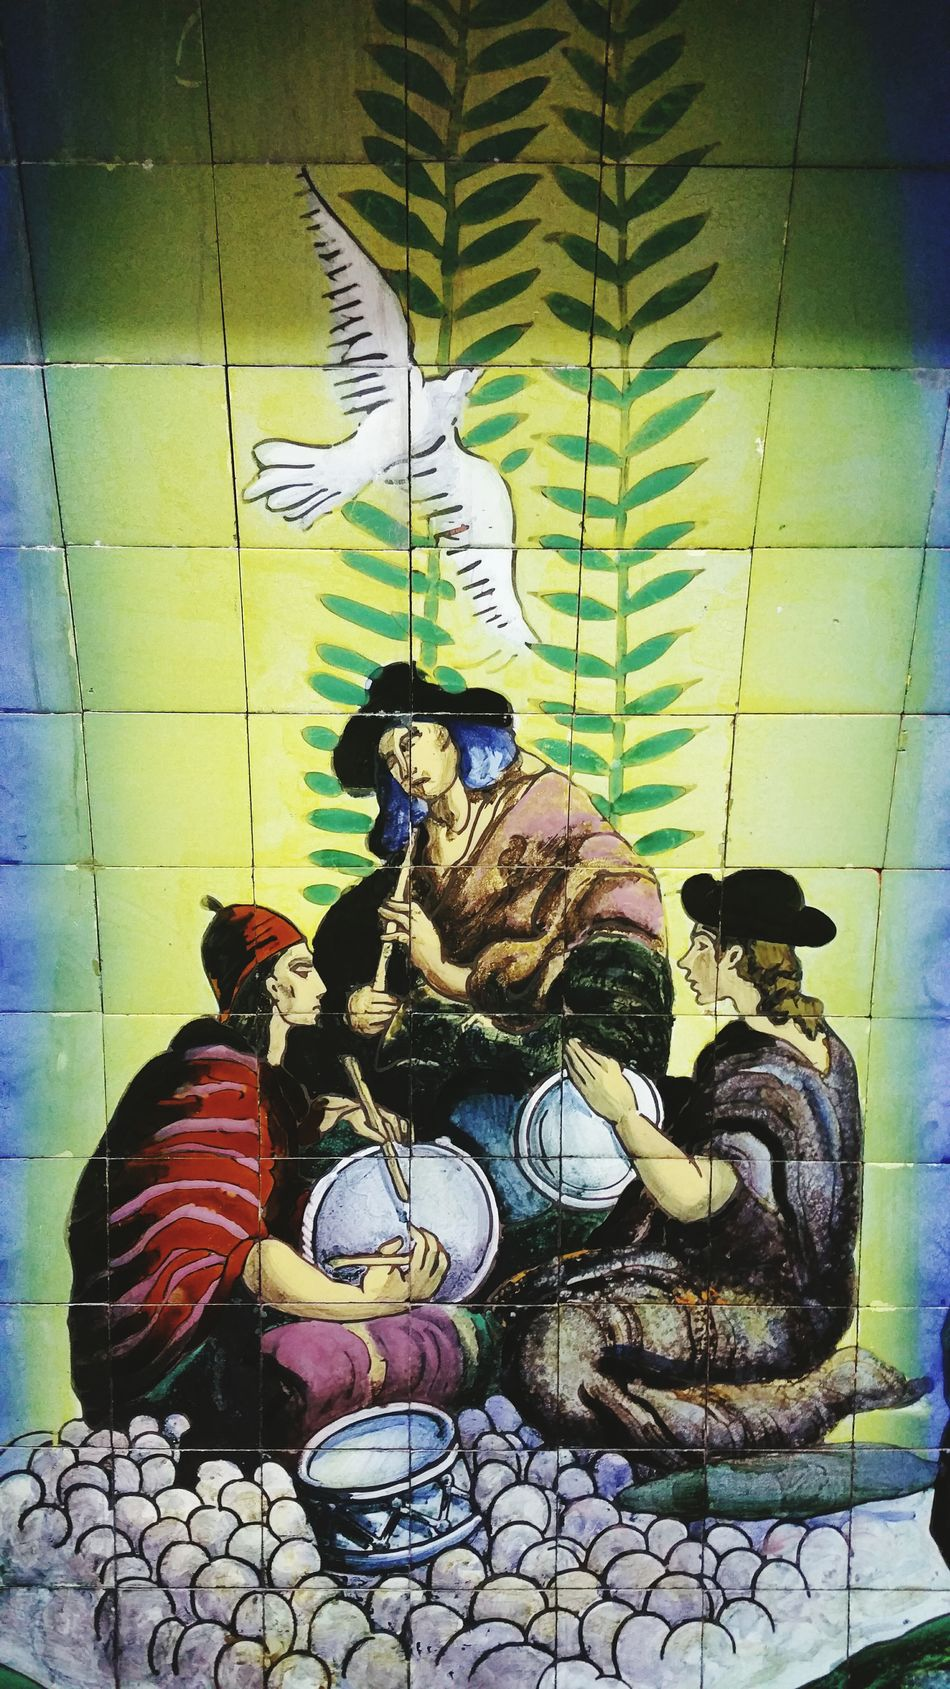 Subte Subway Art Buenos Aires, Recoleta